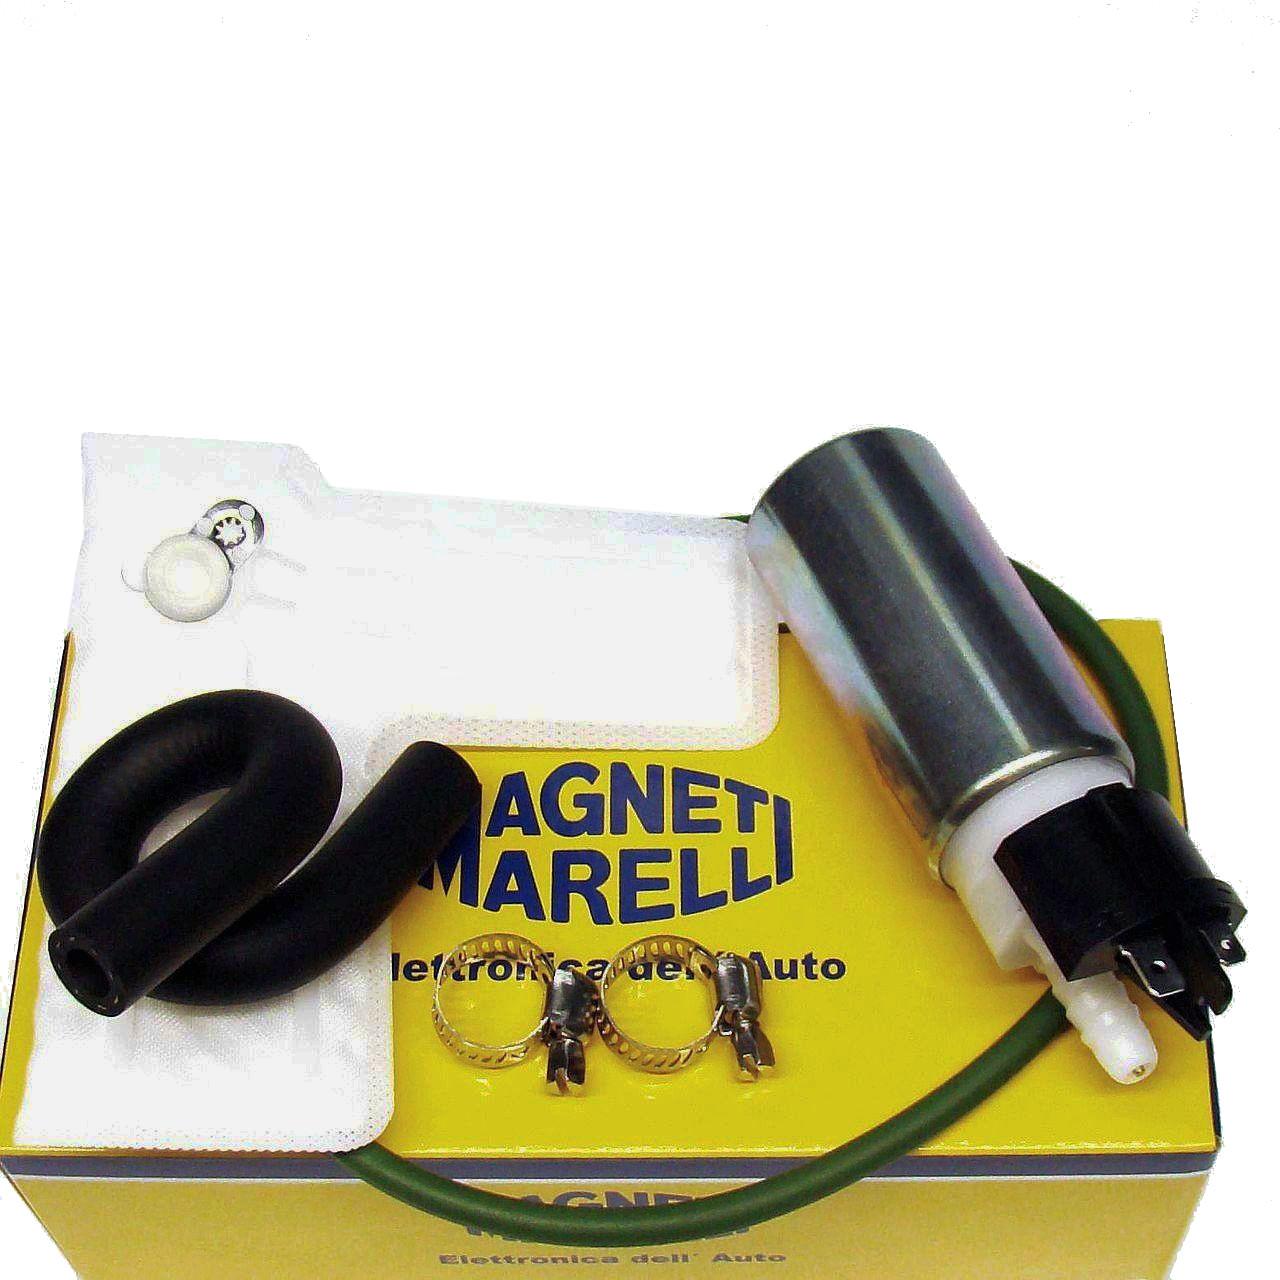 Kraftstoffpumpe JEEP Wrangler II (TJ) 2.4 4.0 Benzinpumpe | eBay